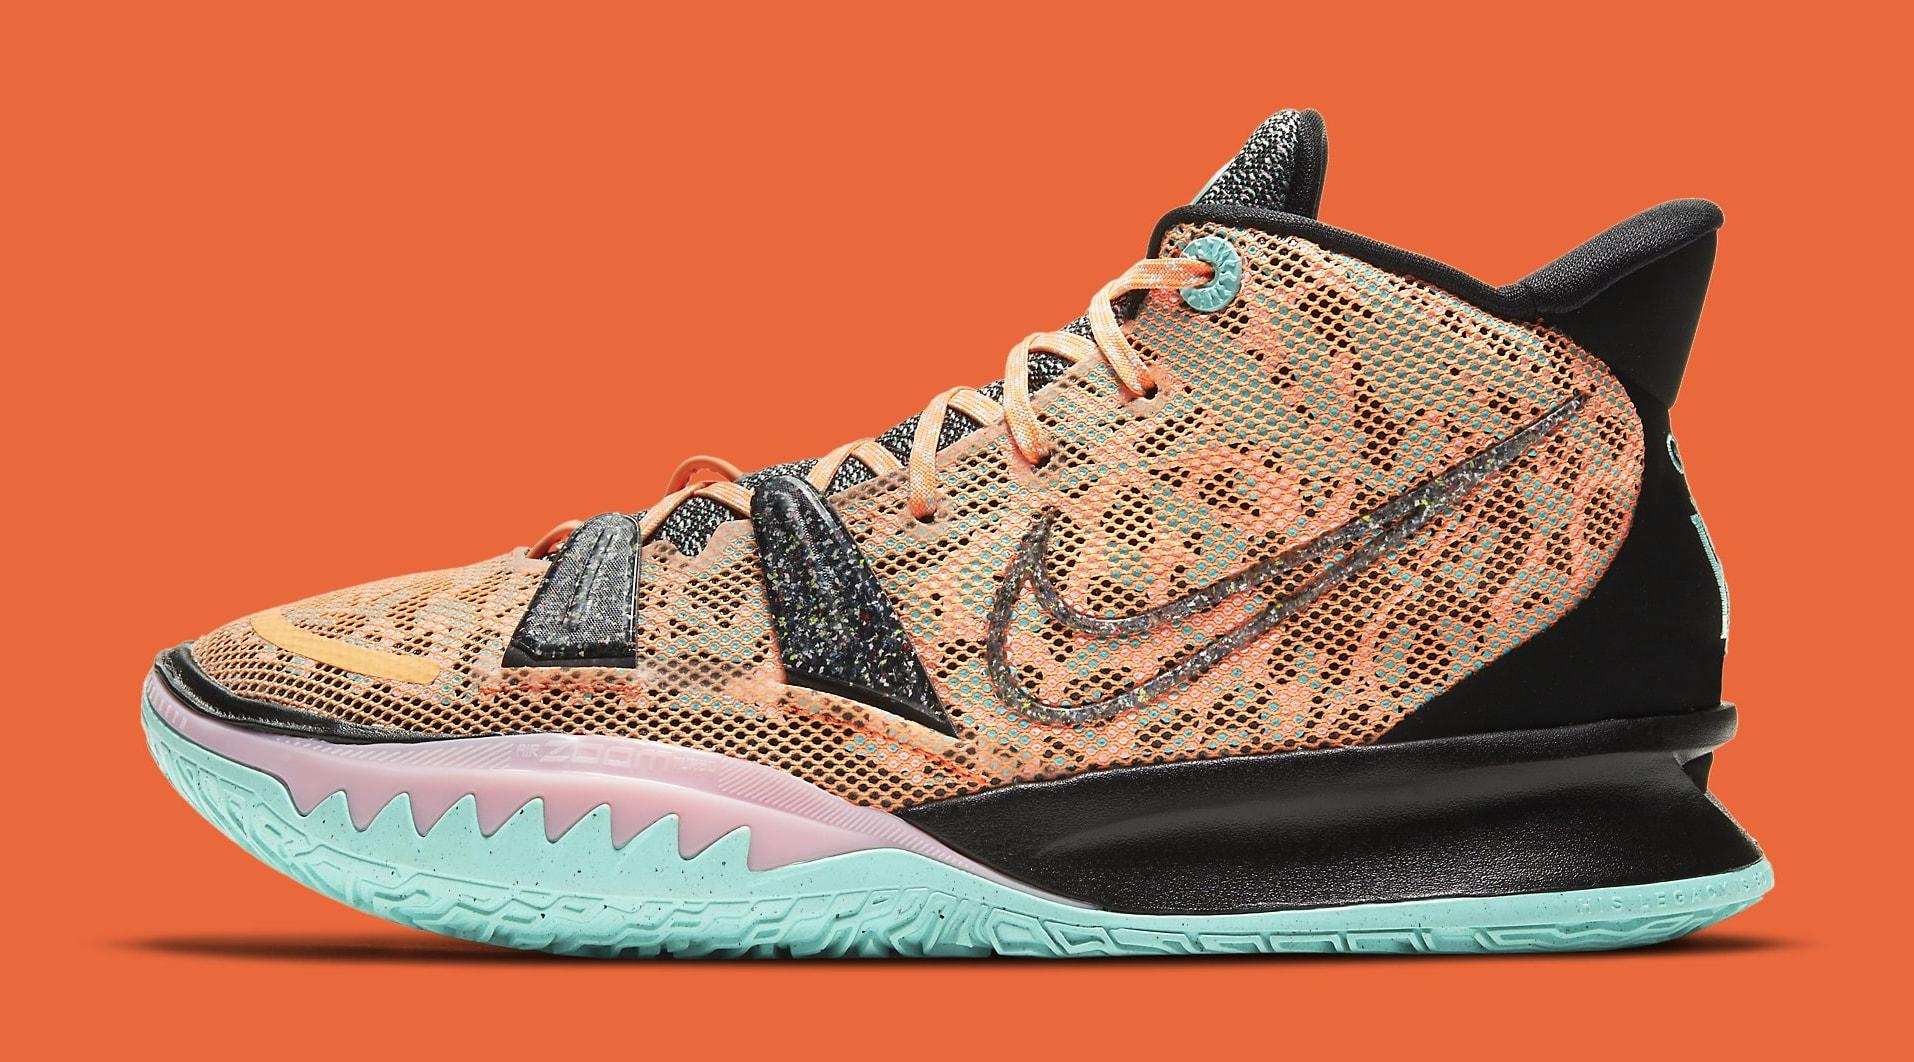 Nike Kyrie 7 'All-Star' DD1447-800 Lateral